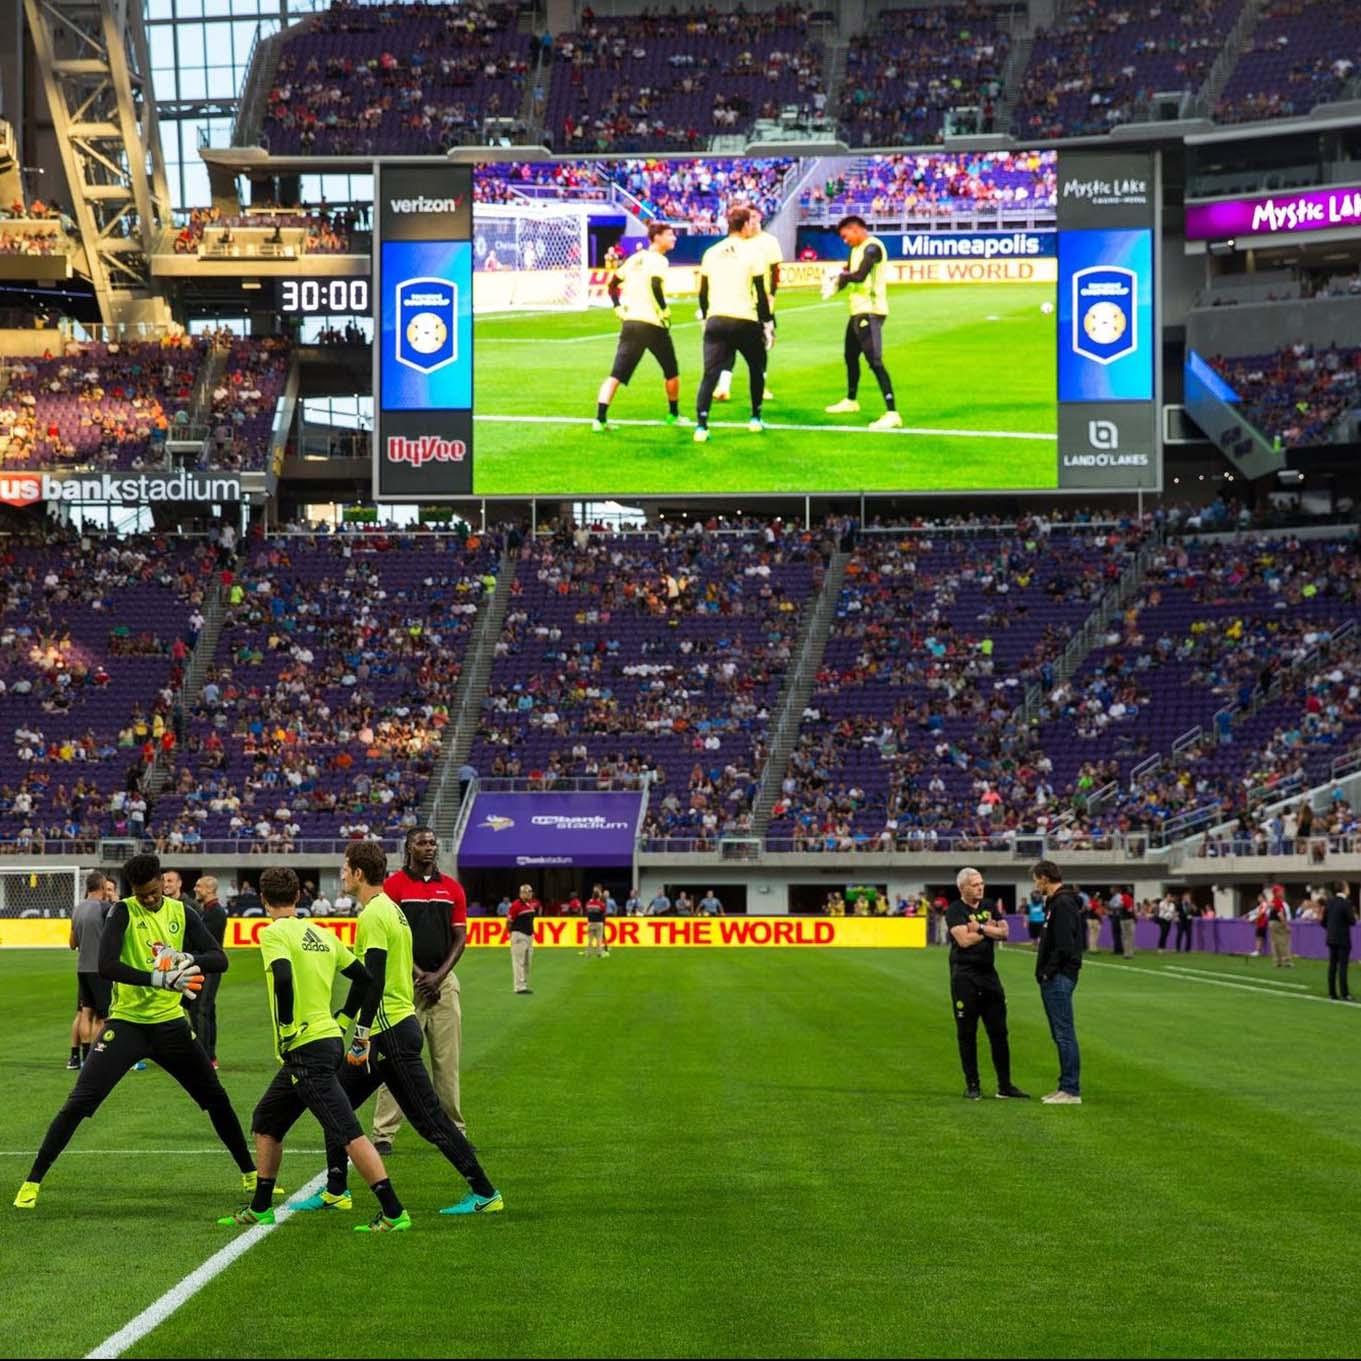 giant led screen stadium